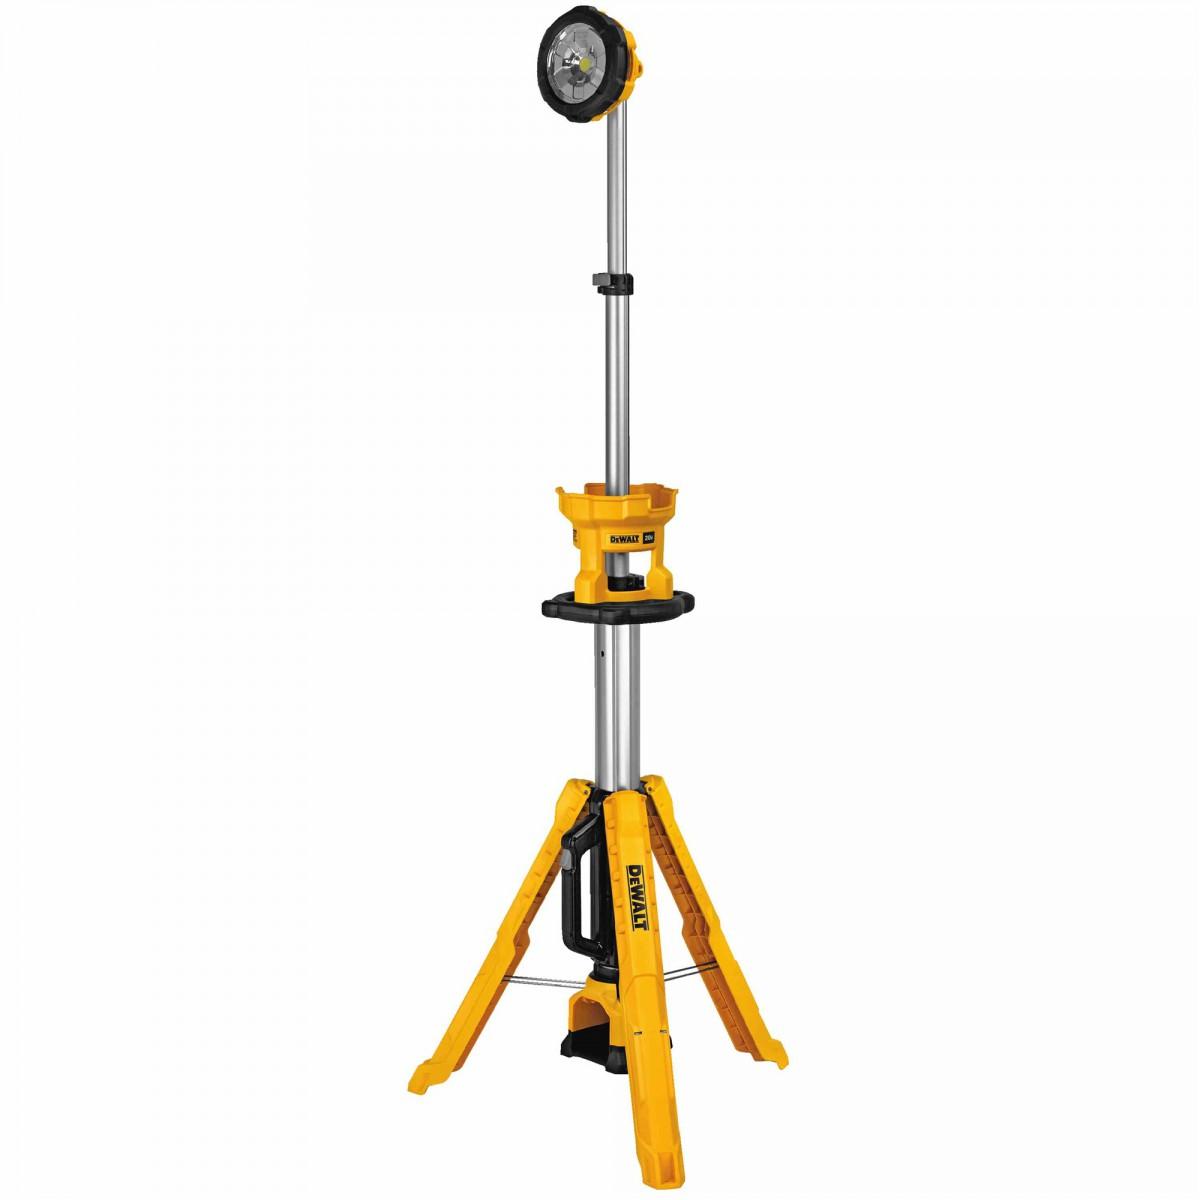 Dewalt 20v Cordless Tripod Light Dcl079b Dcl079r1 Tool Craze